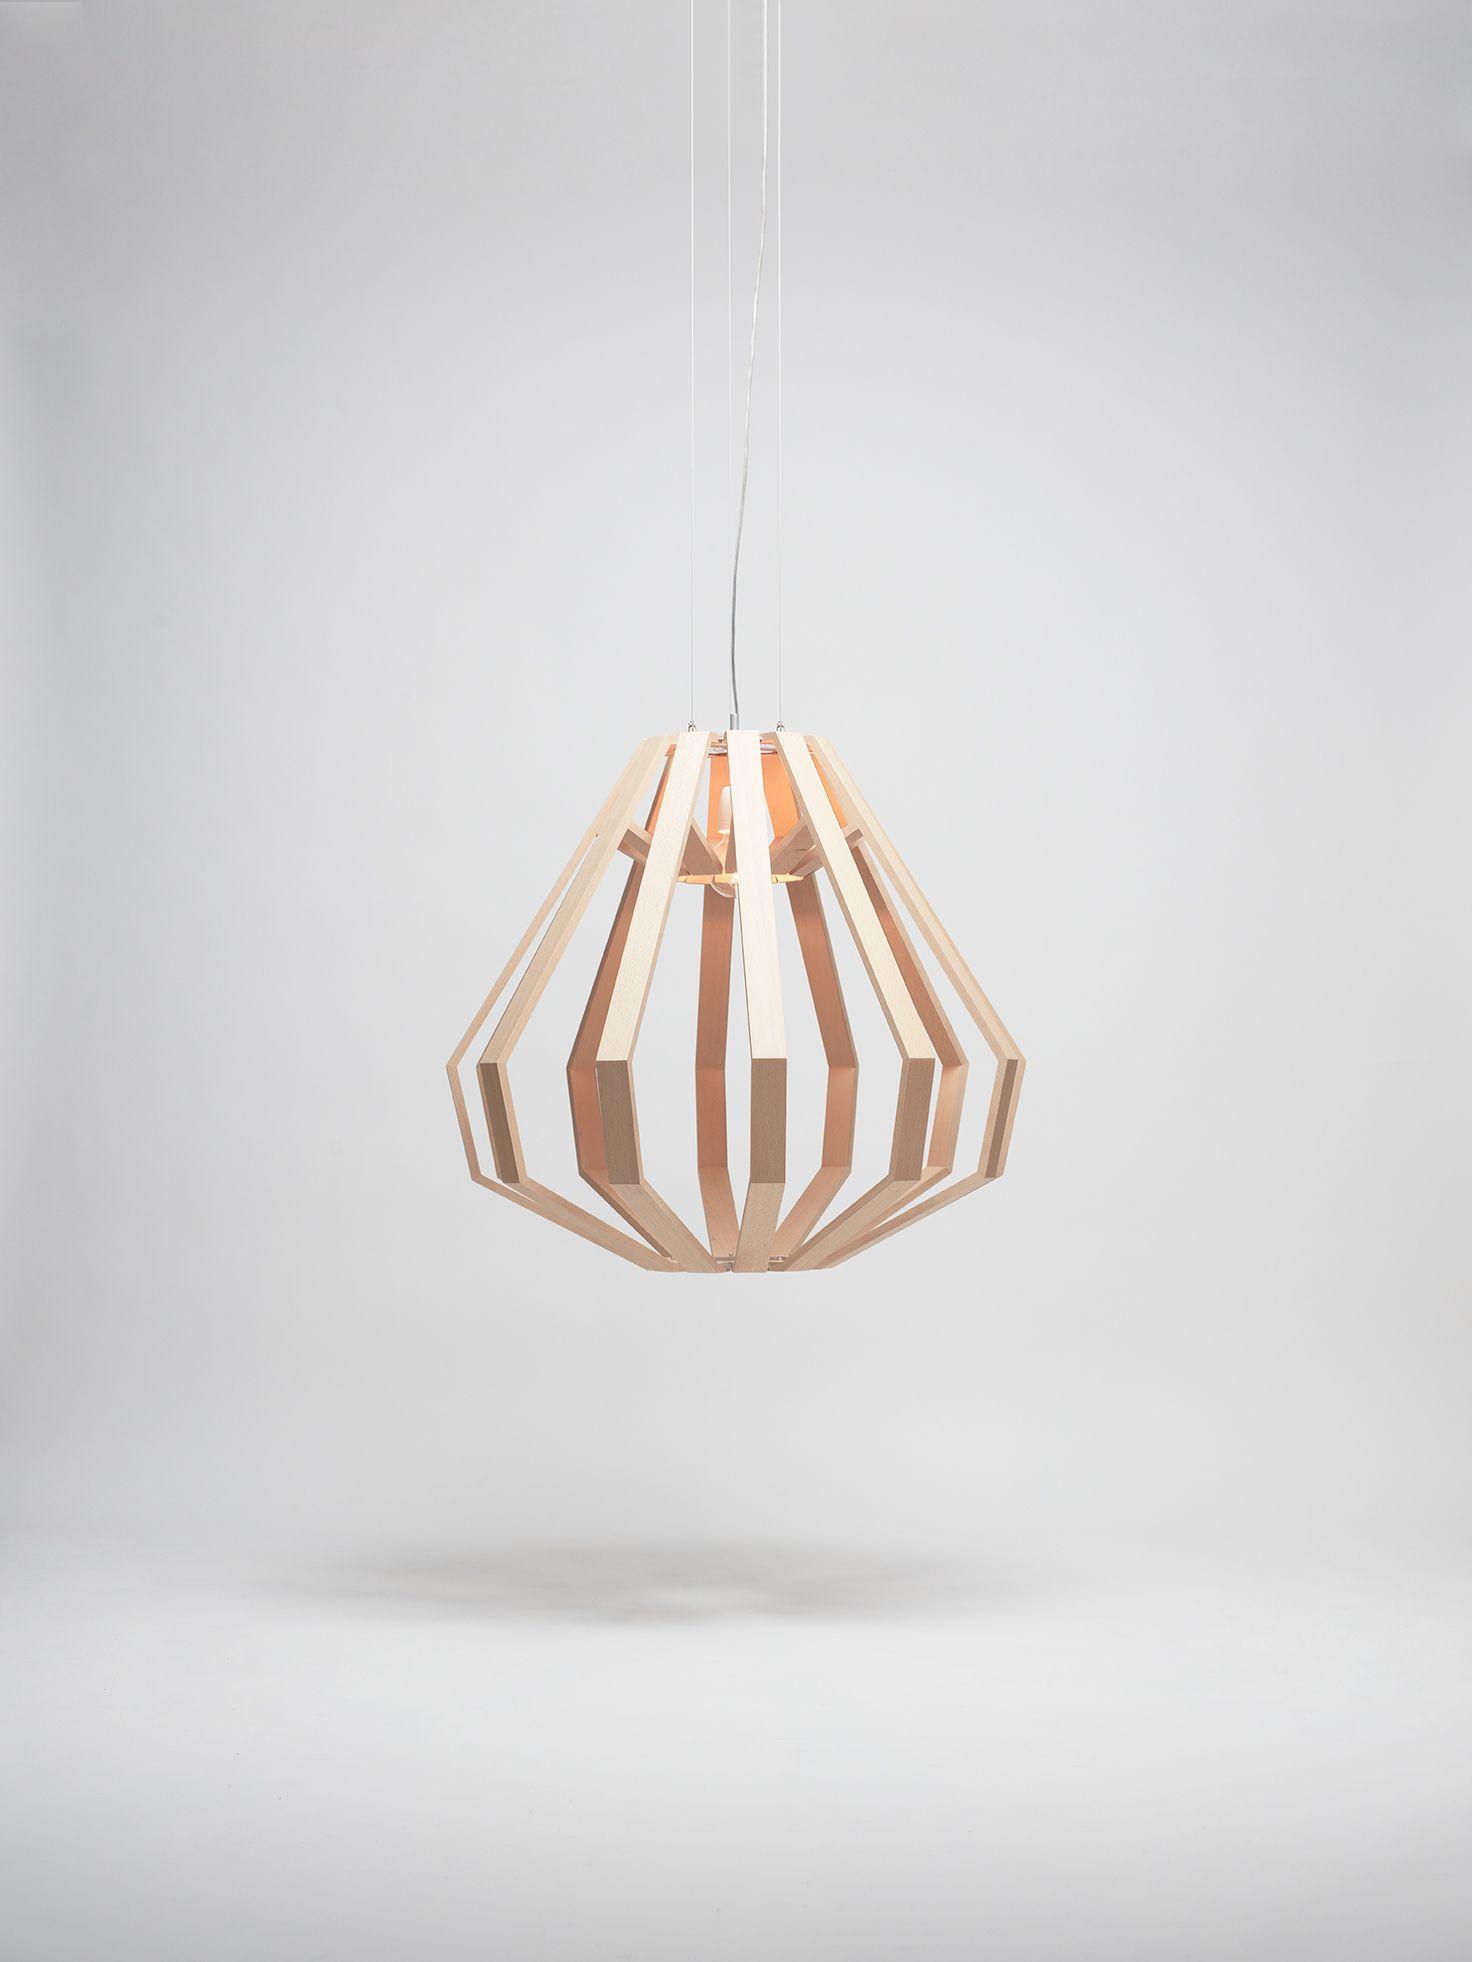 Forme Suspendu Bois ConiqueDesign Apollo De Grande En Lampe c5luK3JF1T